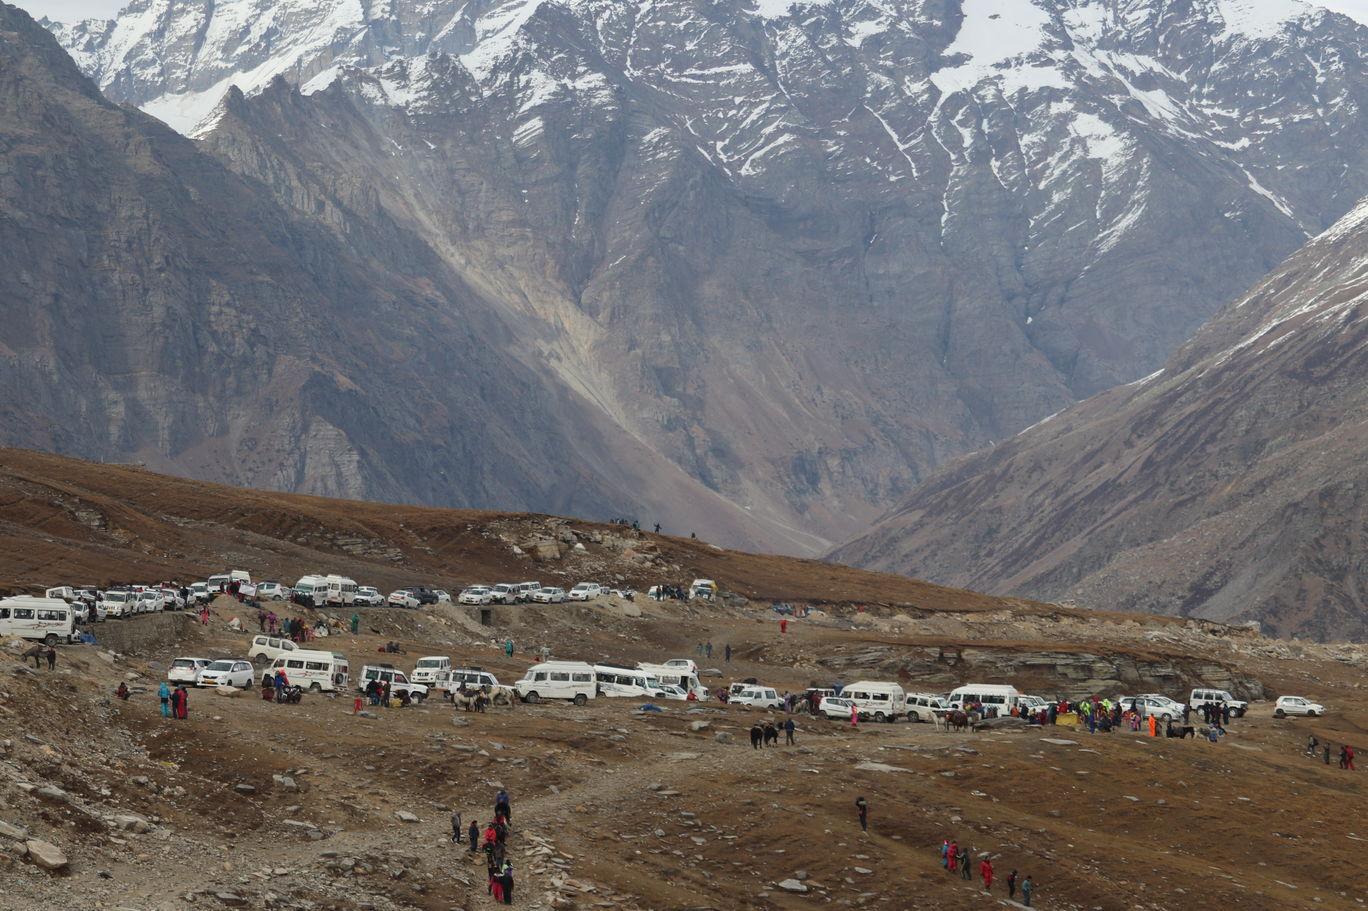 Photo of Rohtang La By Dungar jangid